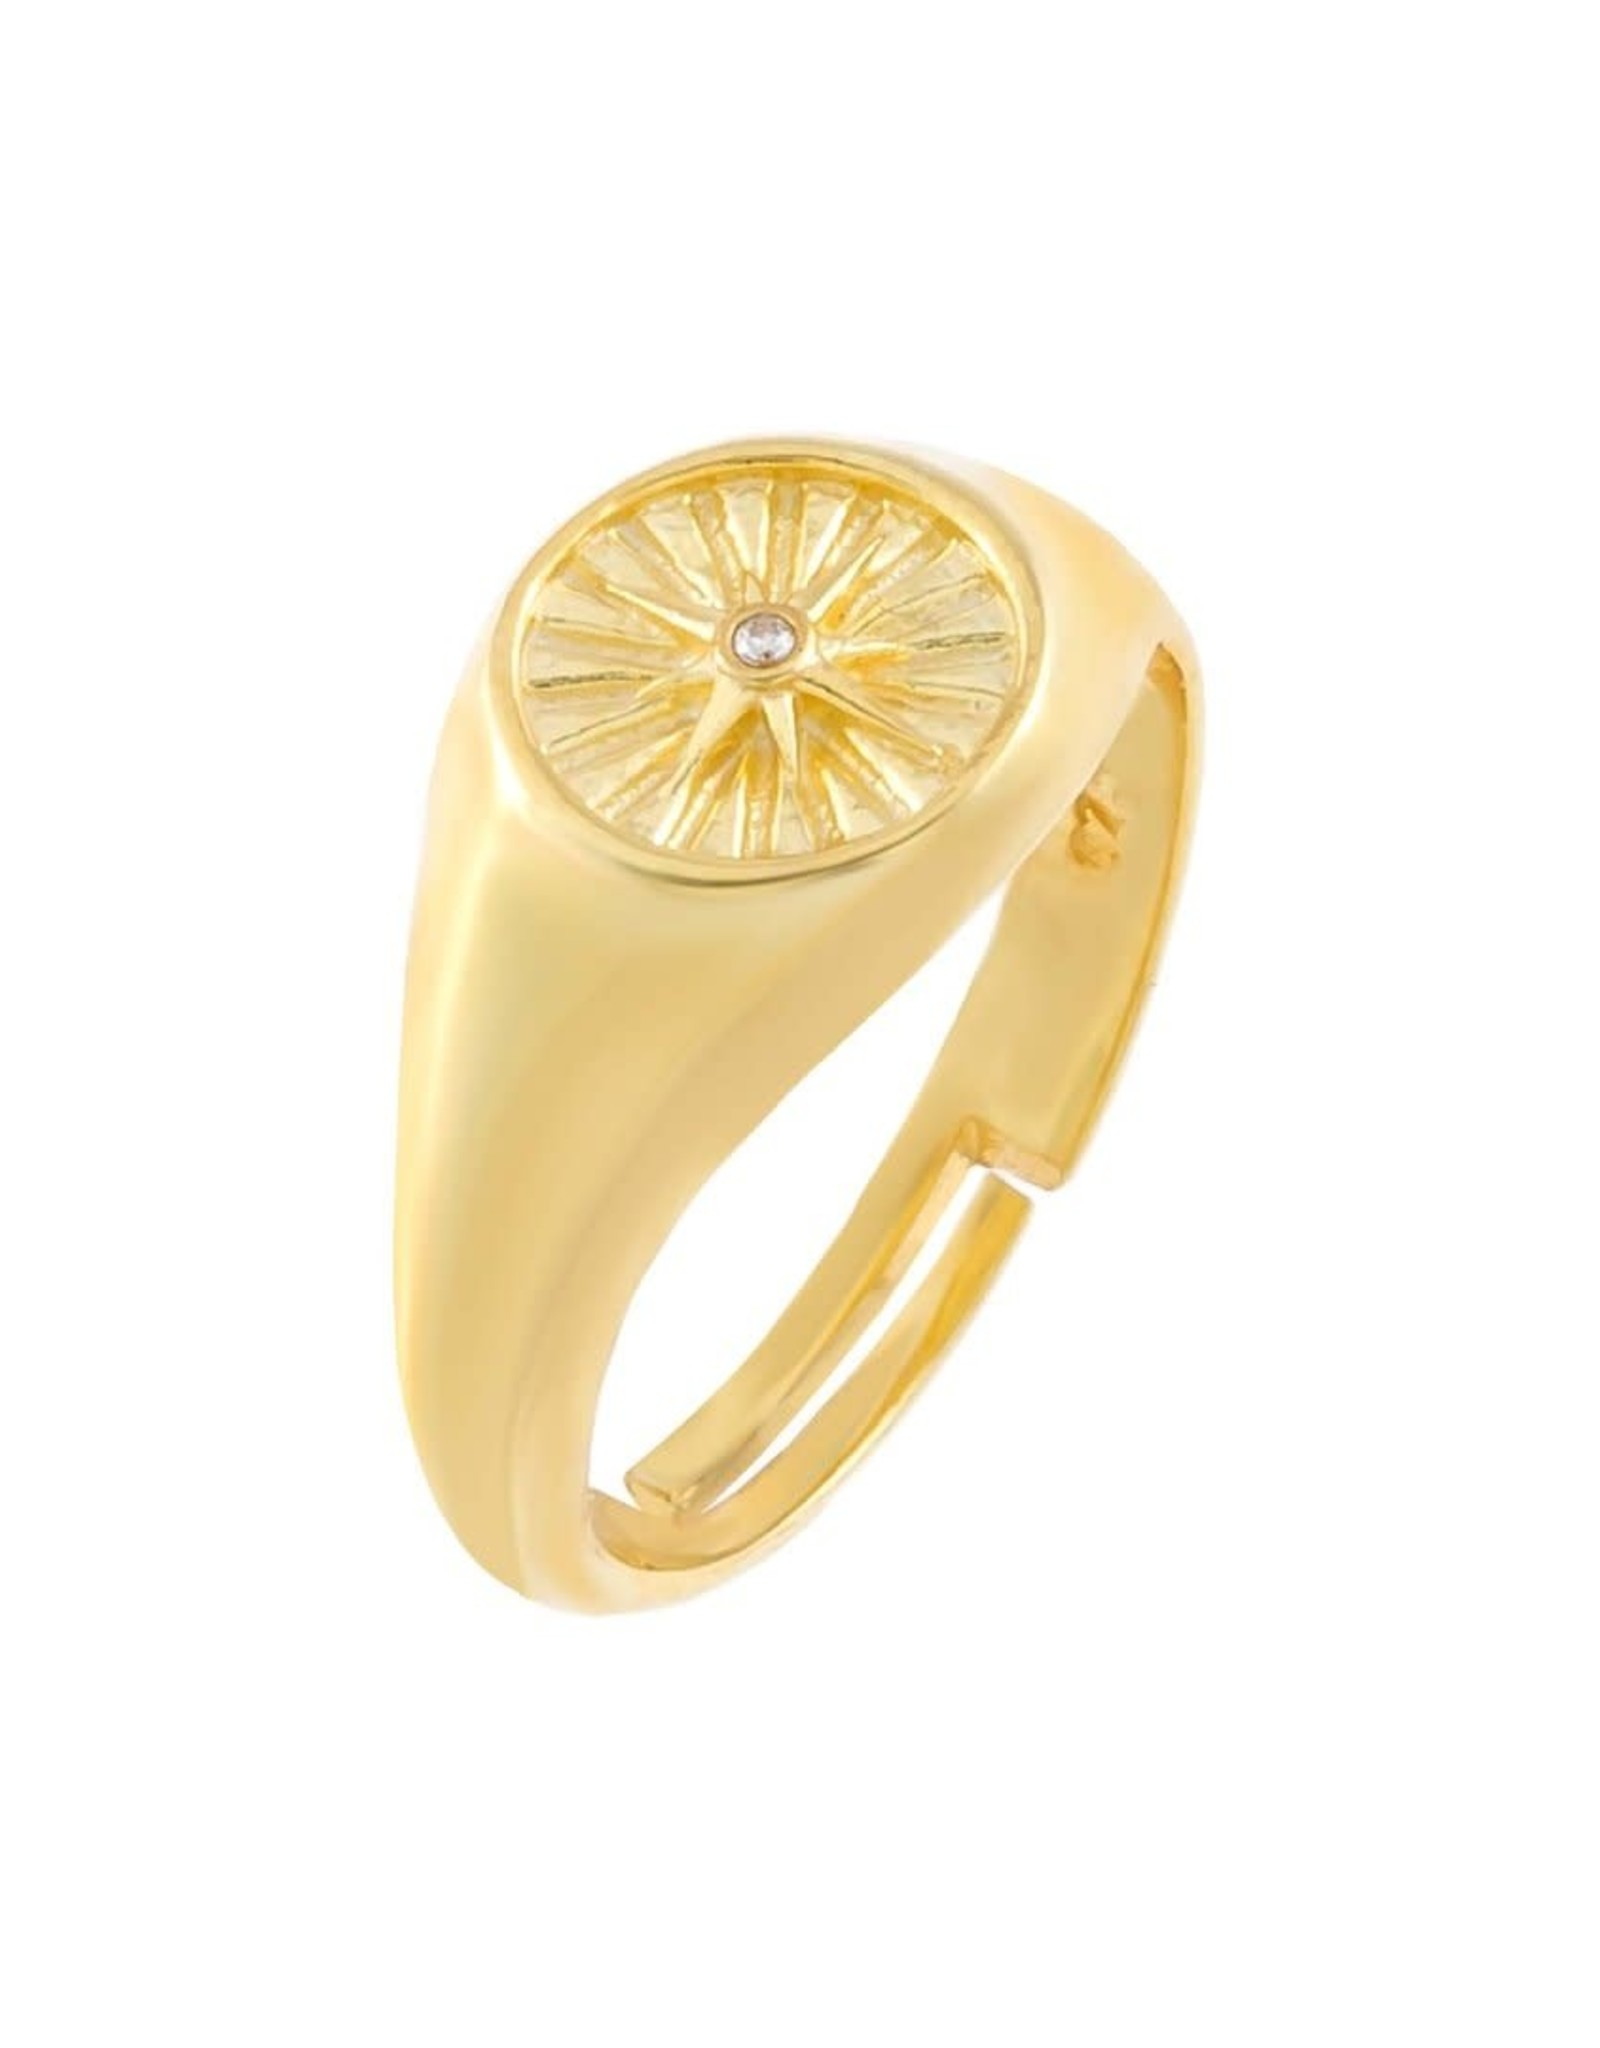 Adinas CZ Starburst Adjustable Signet Ring